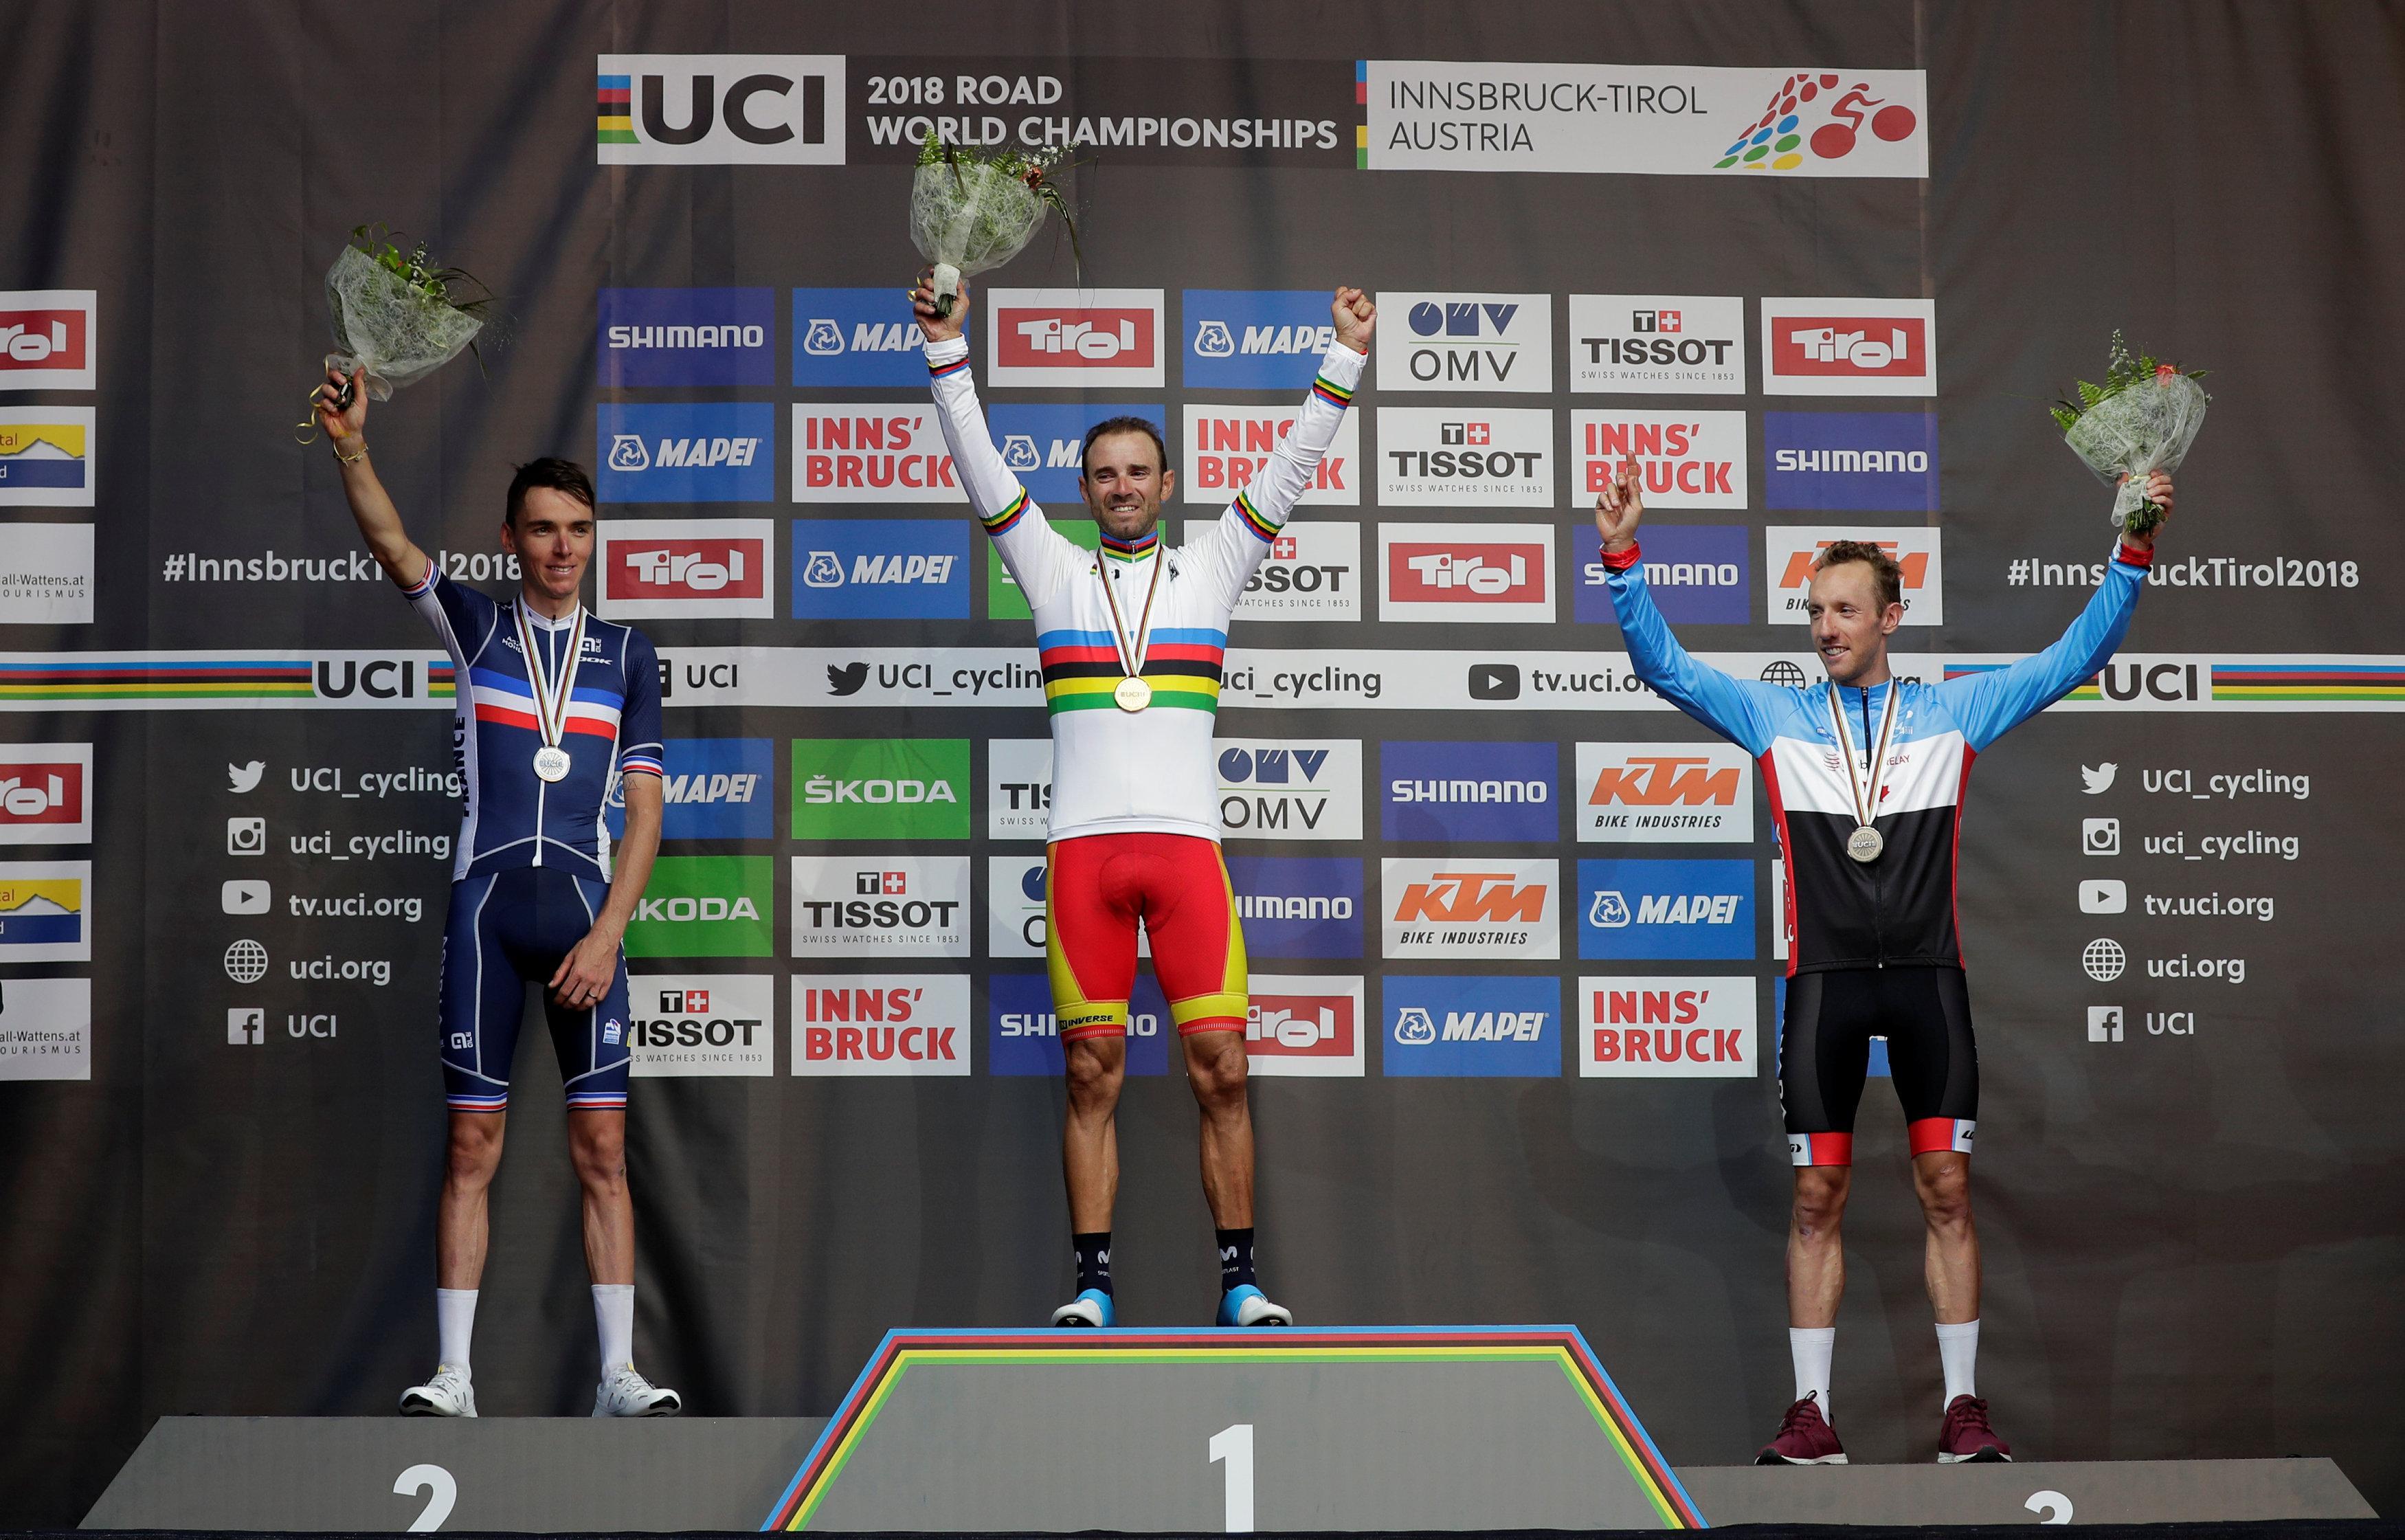 Cycling - Valverde wins men's World Championship road race